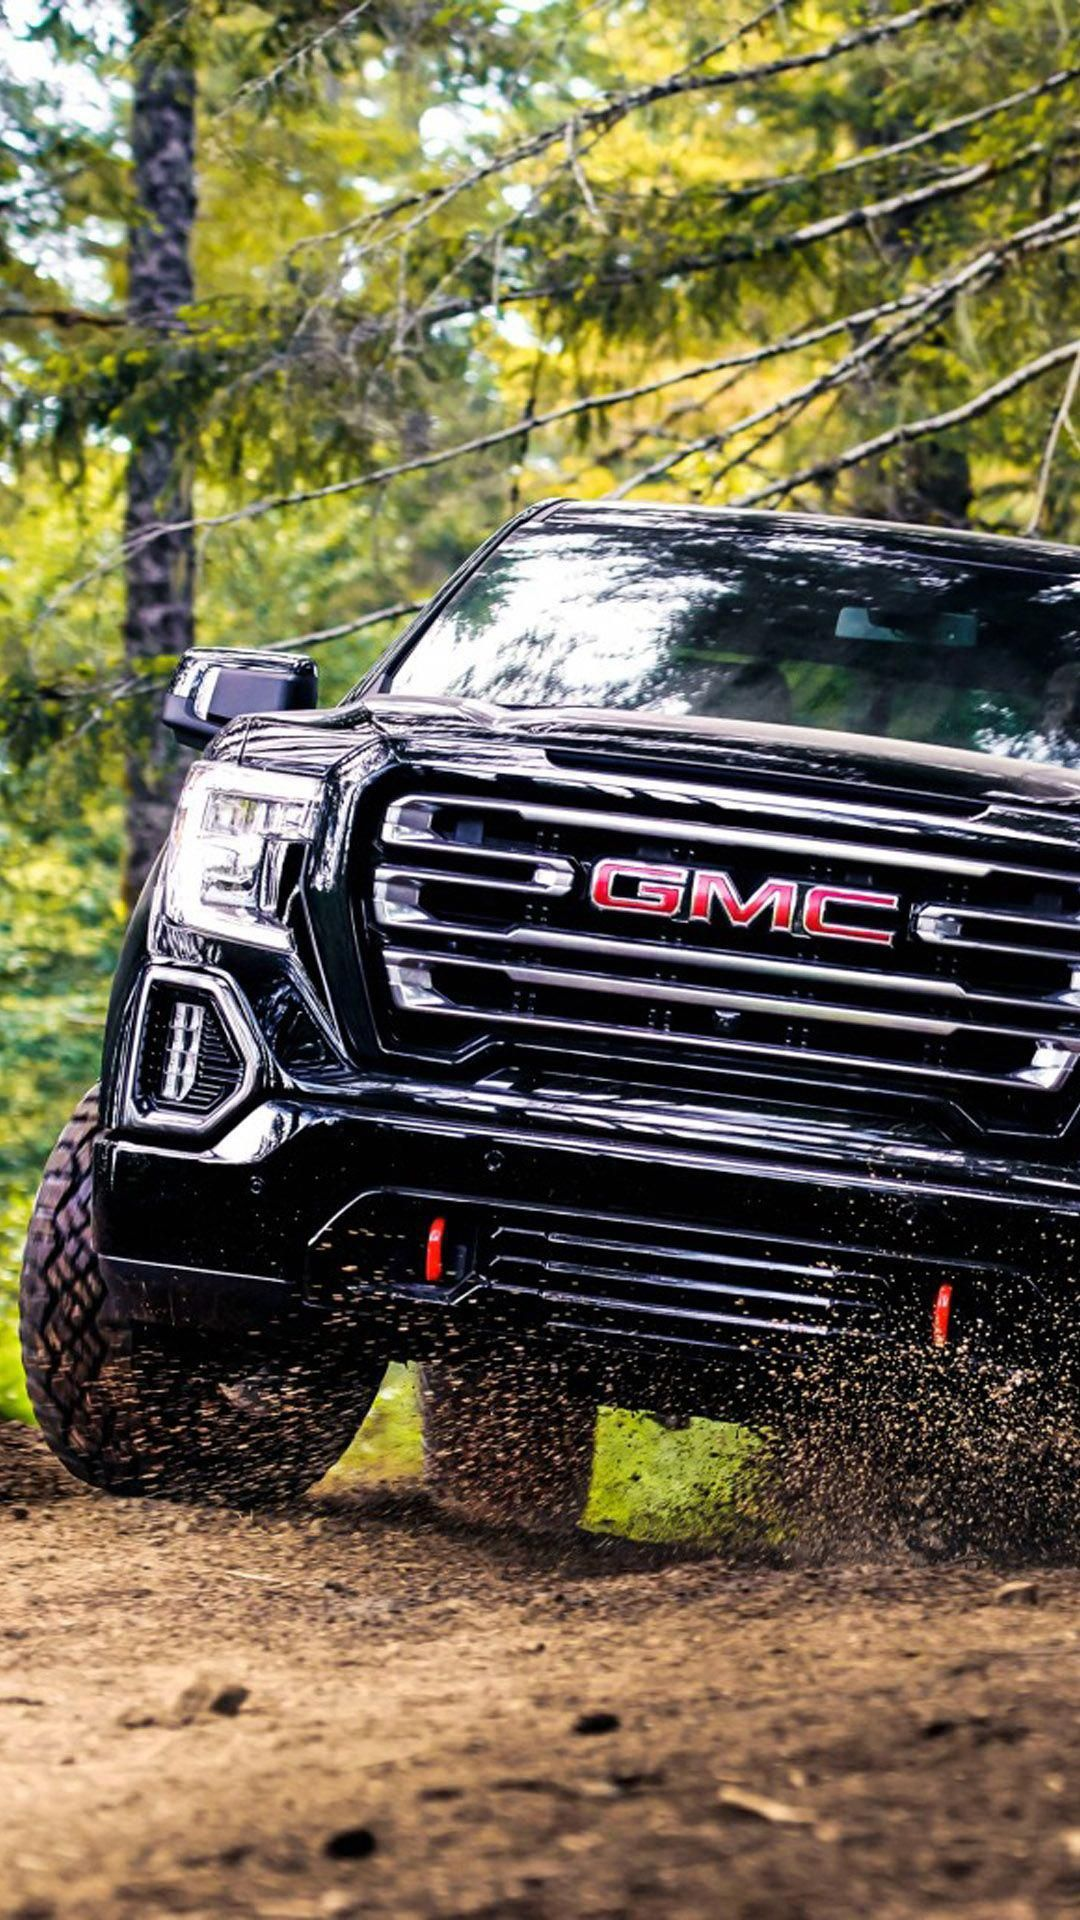 4x4 Trucks Gmctrucks Gmc Trucks